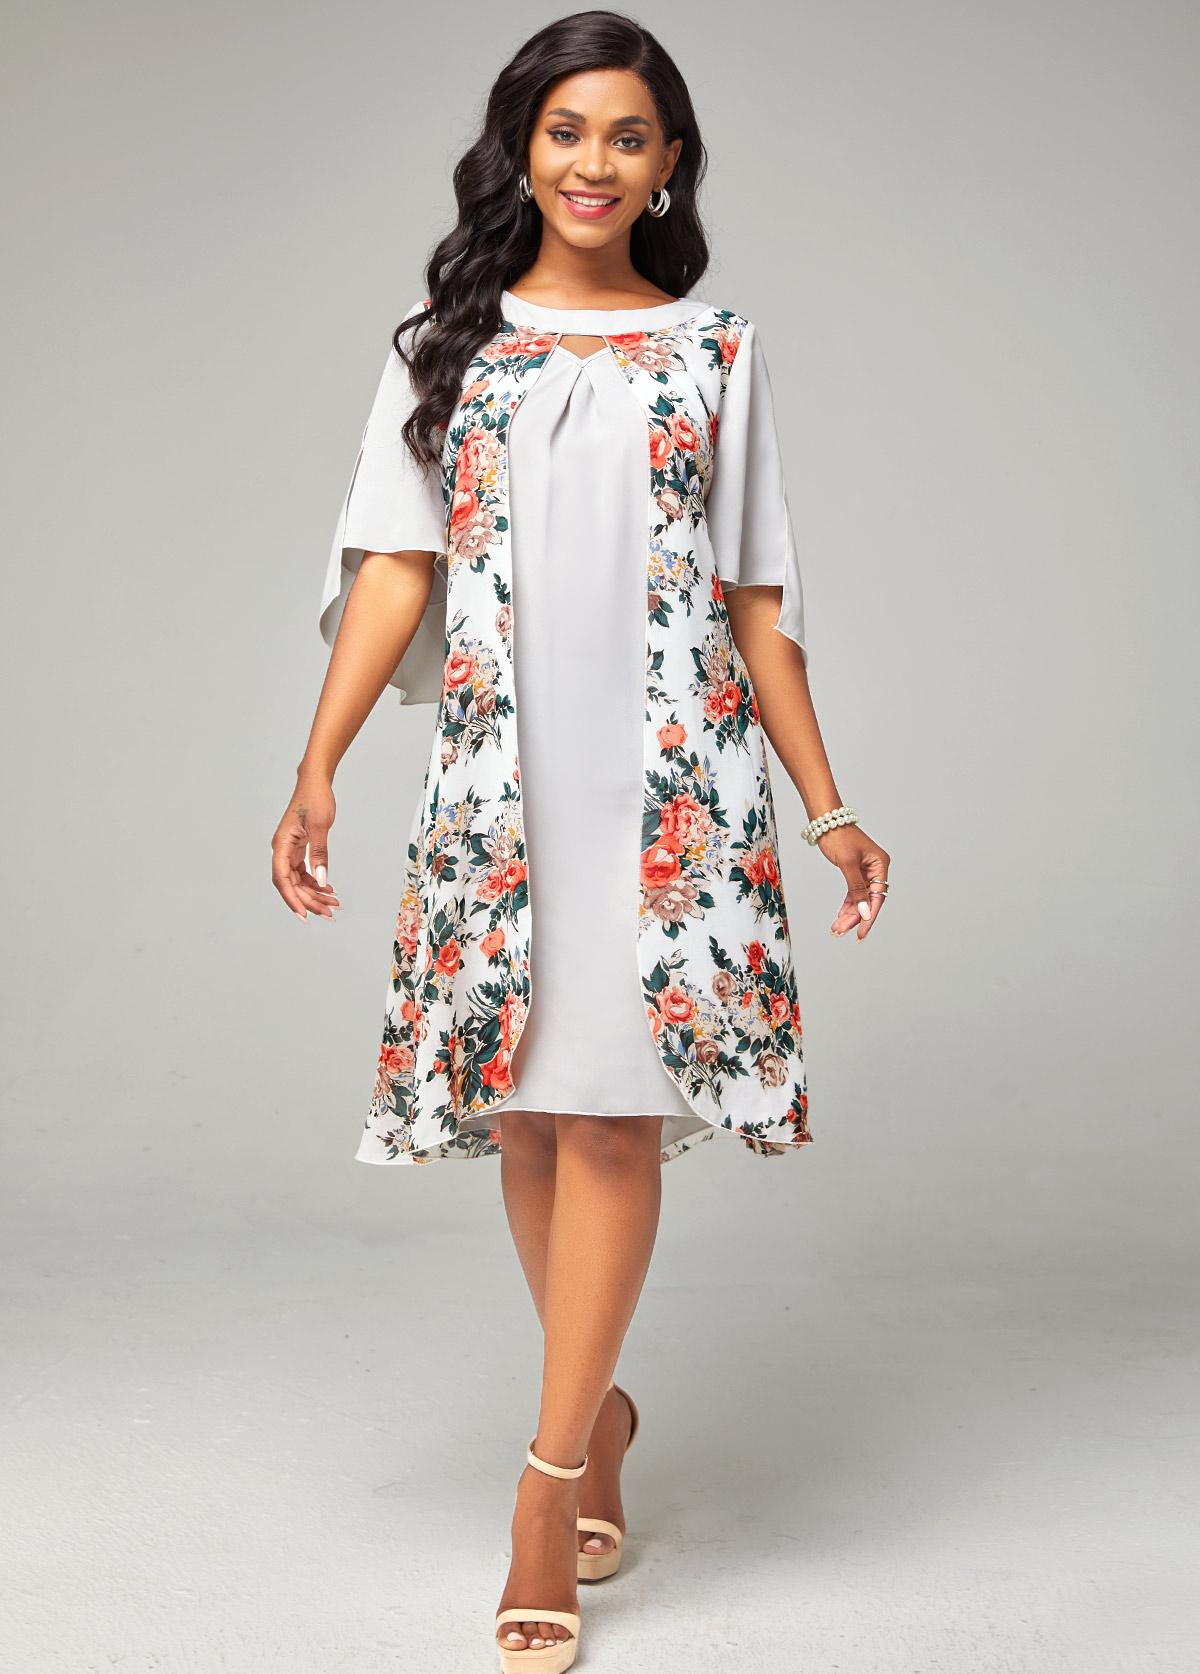 ROTITA Chiffon Keyhole Neckline Floral Print Dress